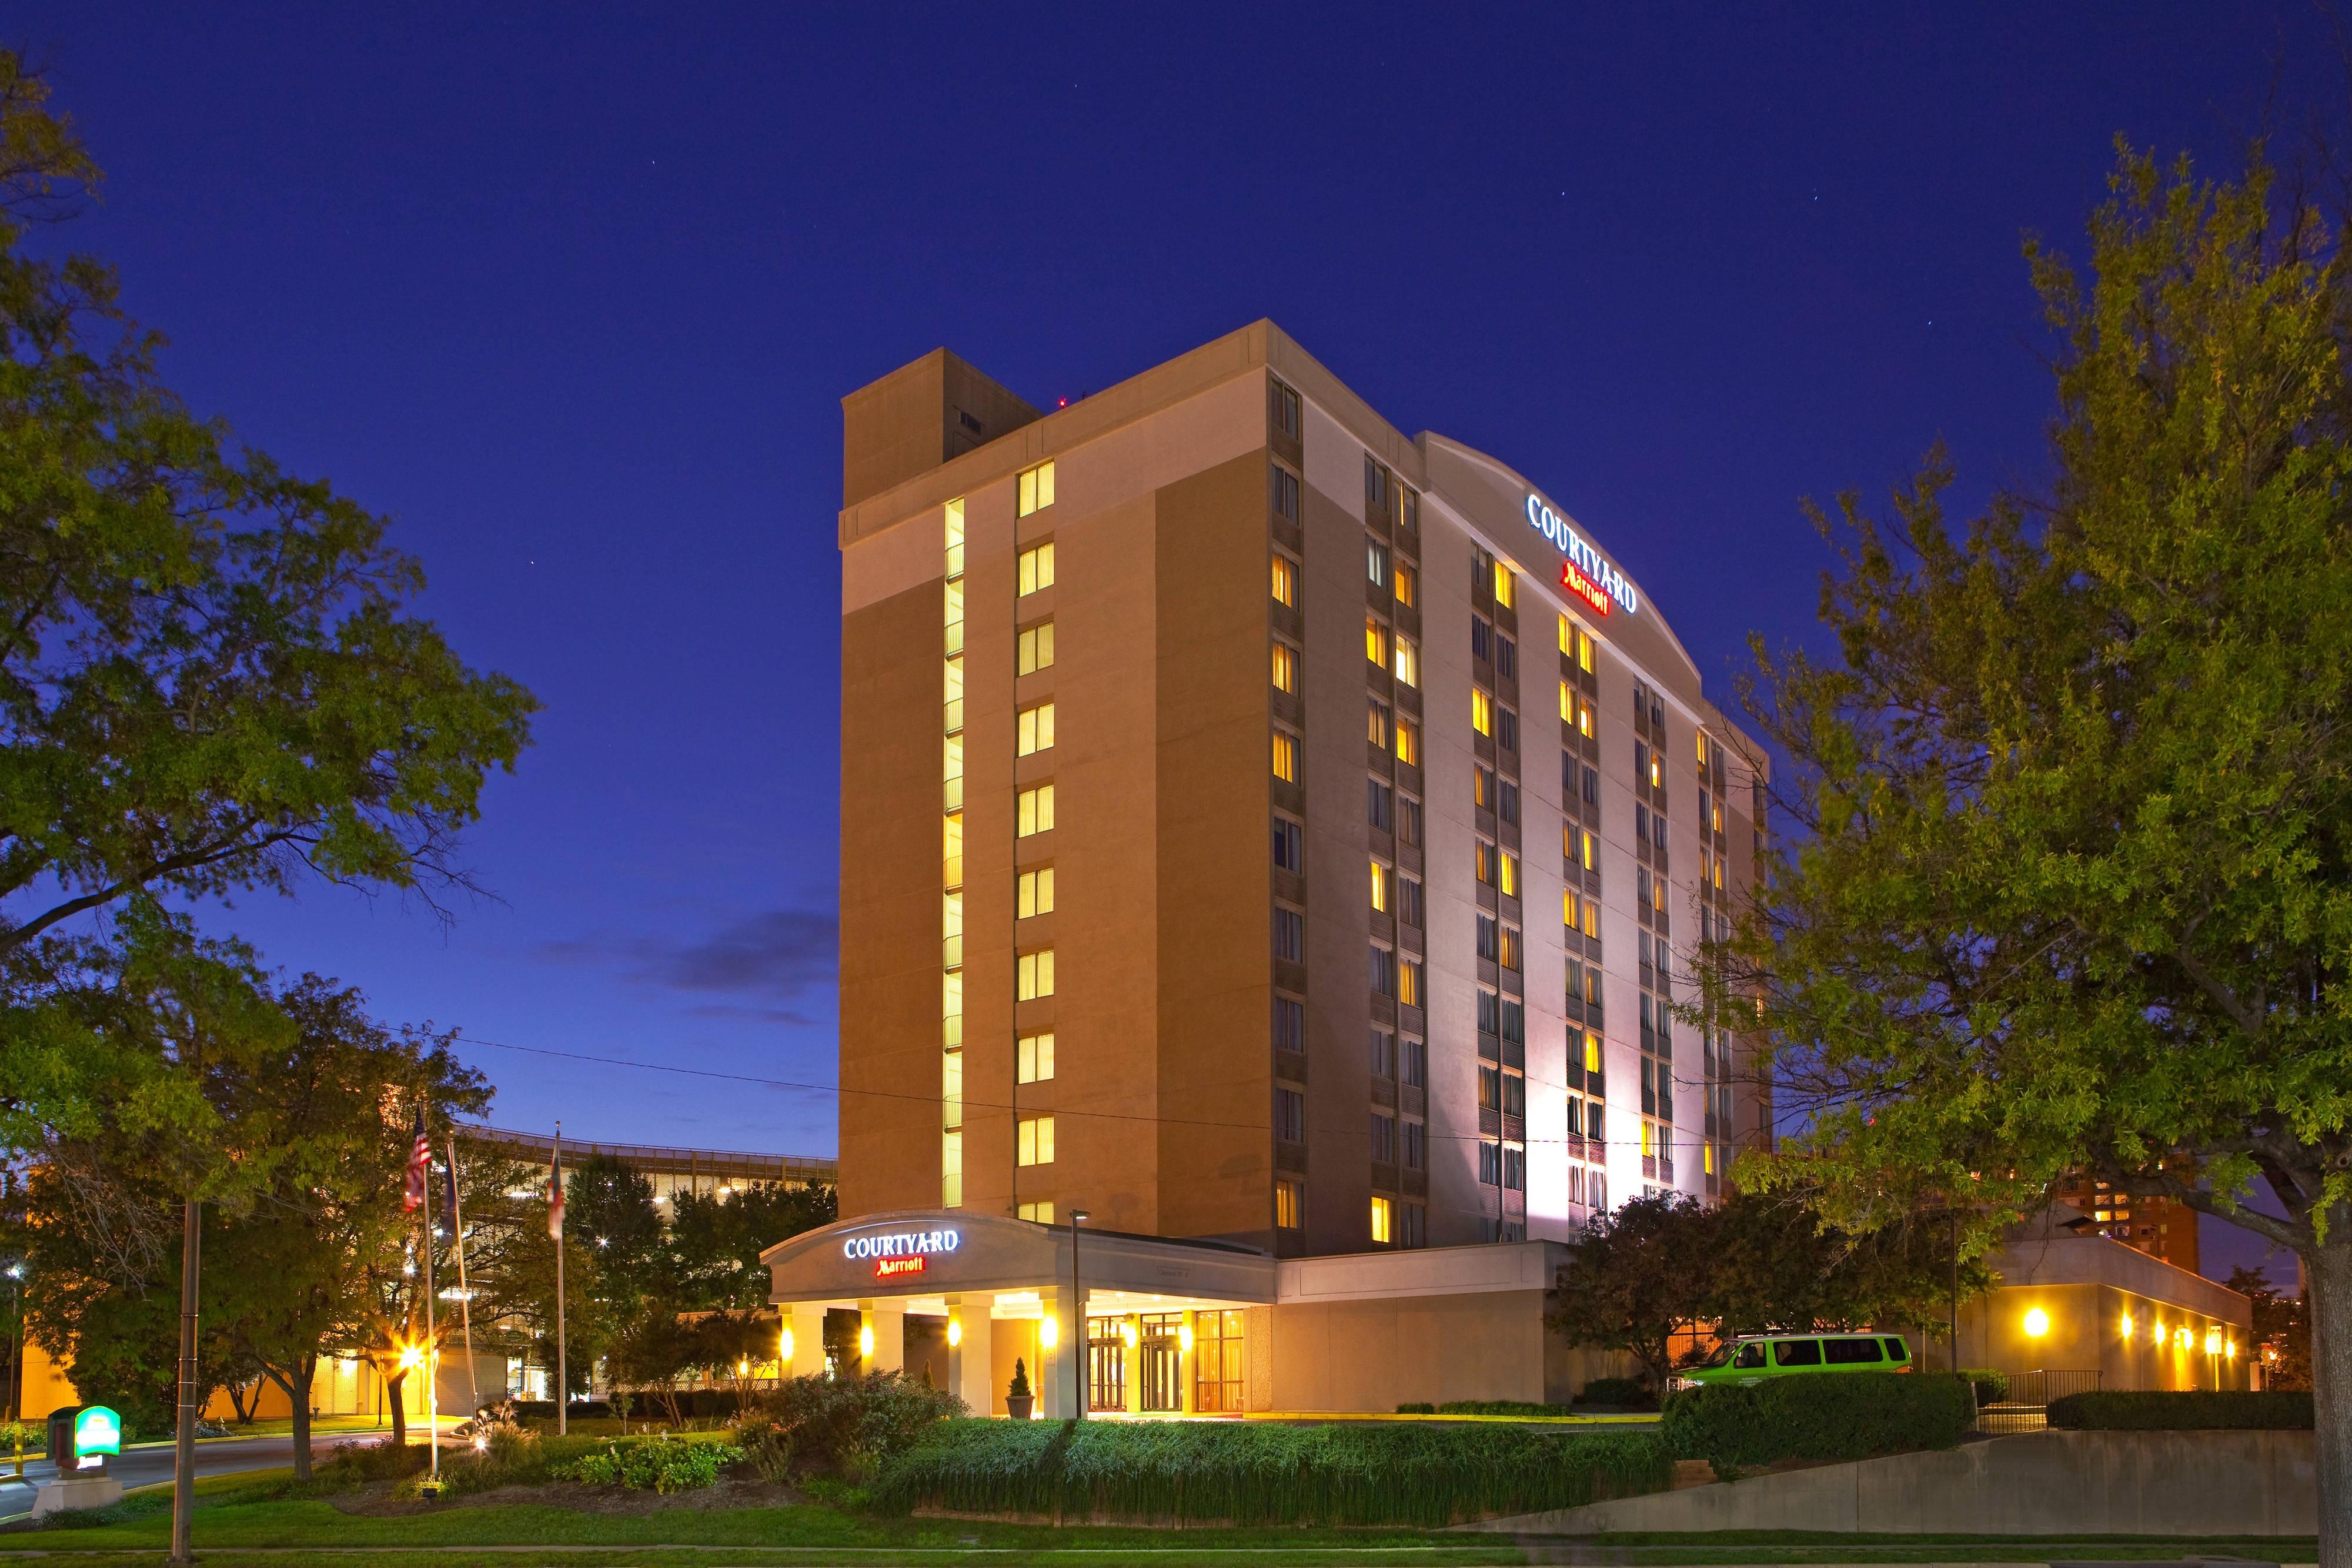 Alexandria, VA hotel exterior